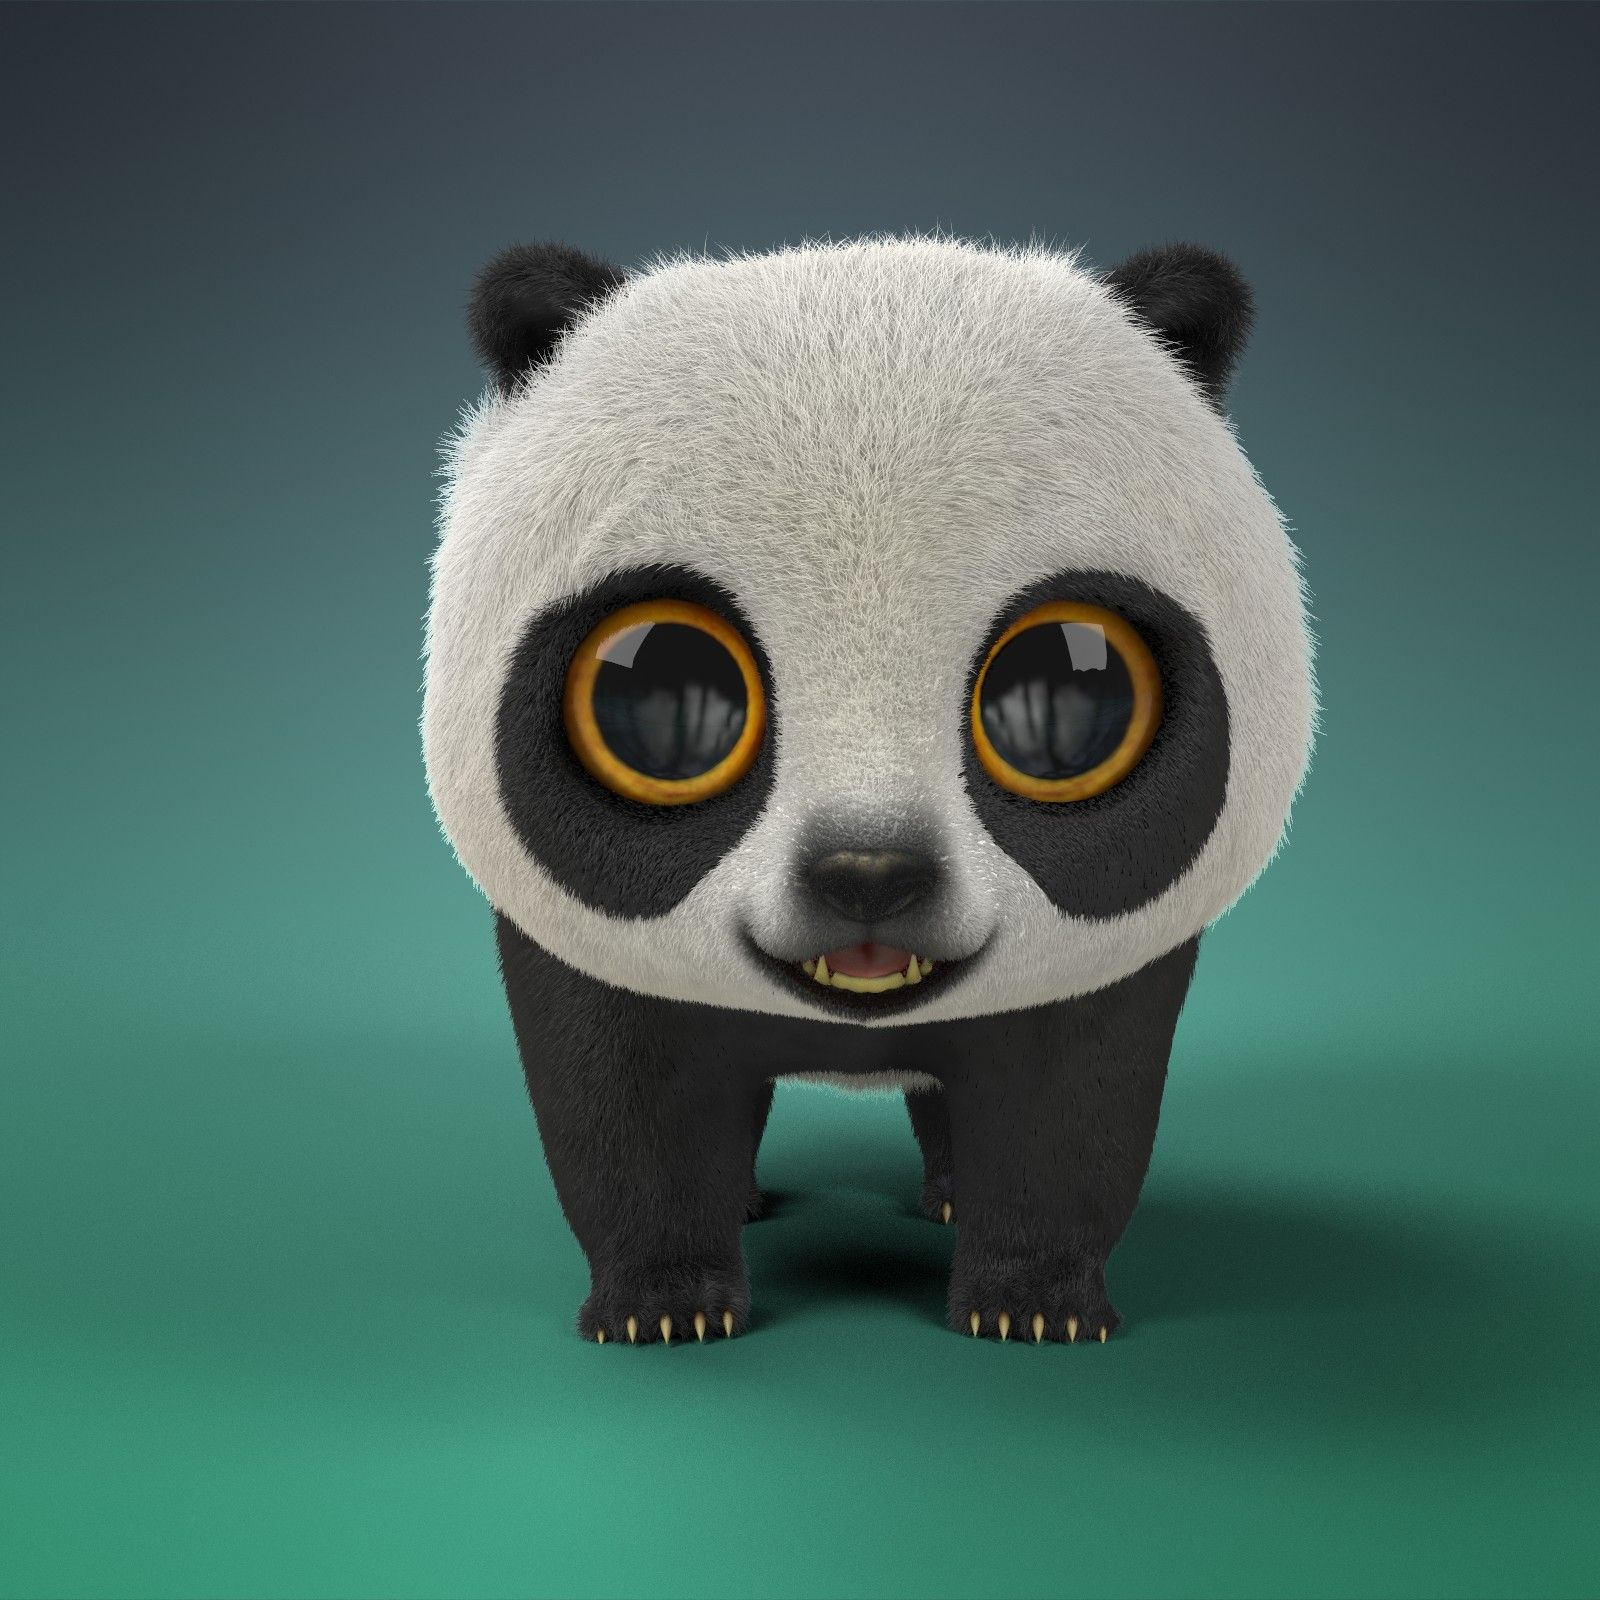 ArtStation Cartoon Panda, Hanna Shmakova Cartoon panda